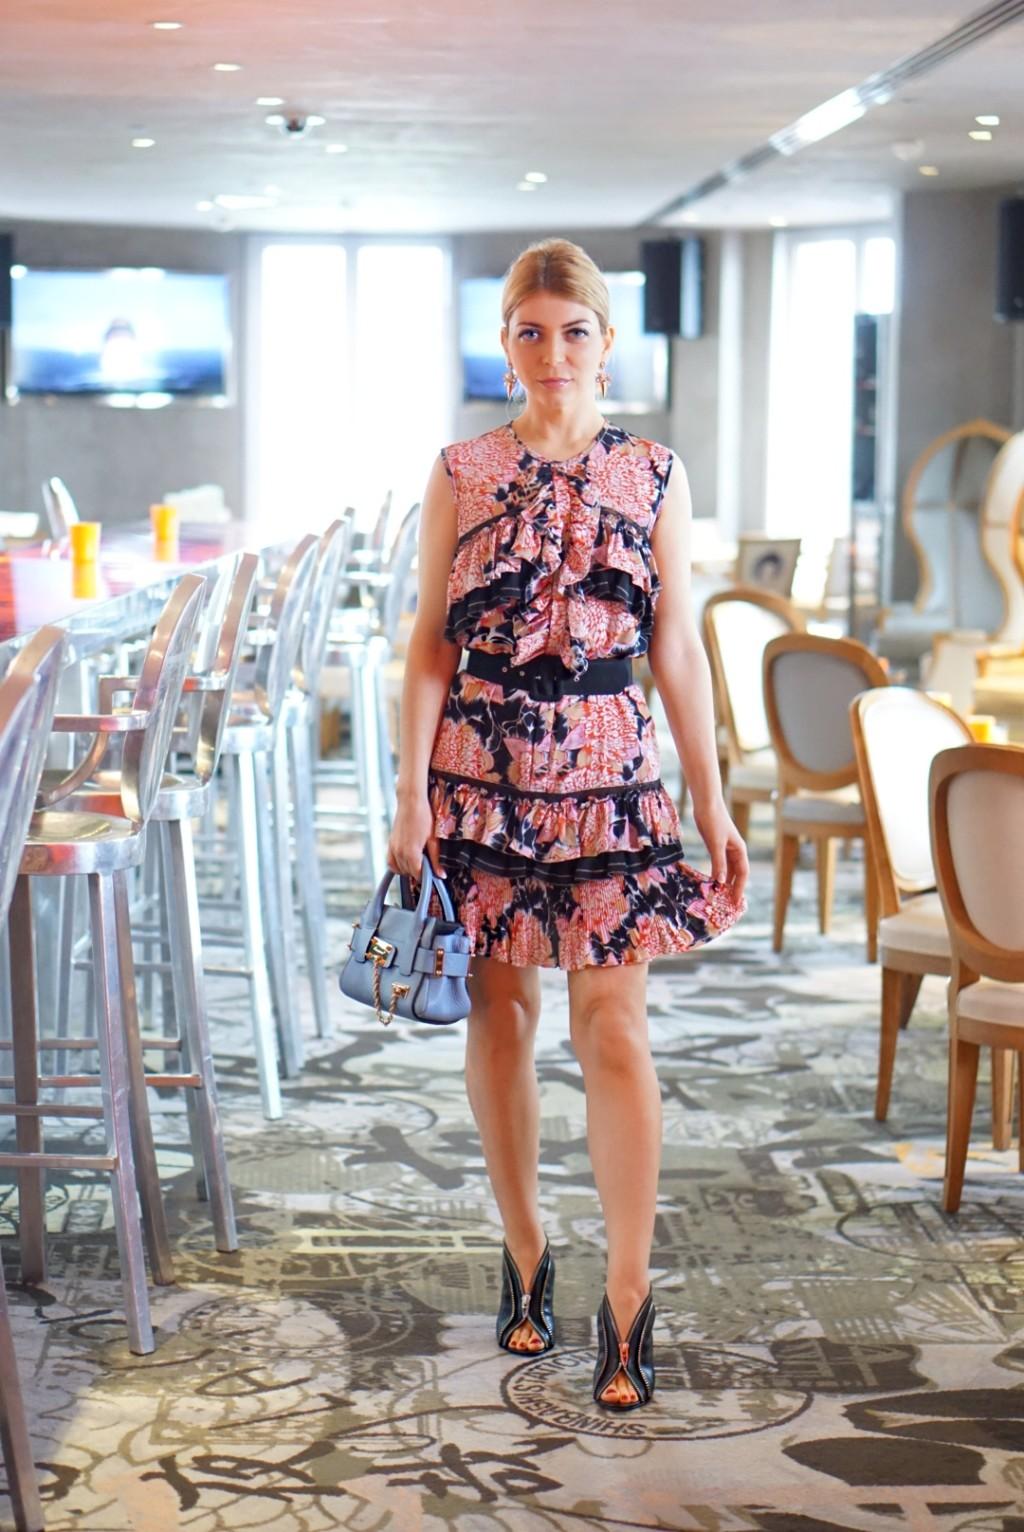 Yuliya Savytska in Kong Paris, Lunch in KONG à la Carrie Bradshaw - #jolimentblogxpfw